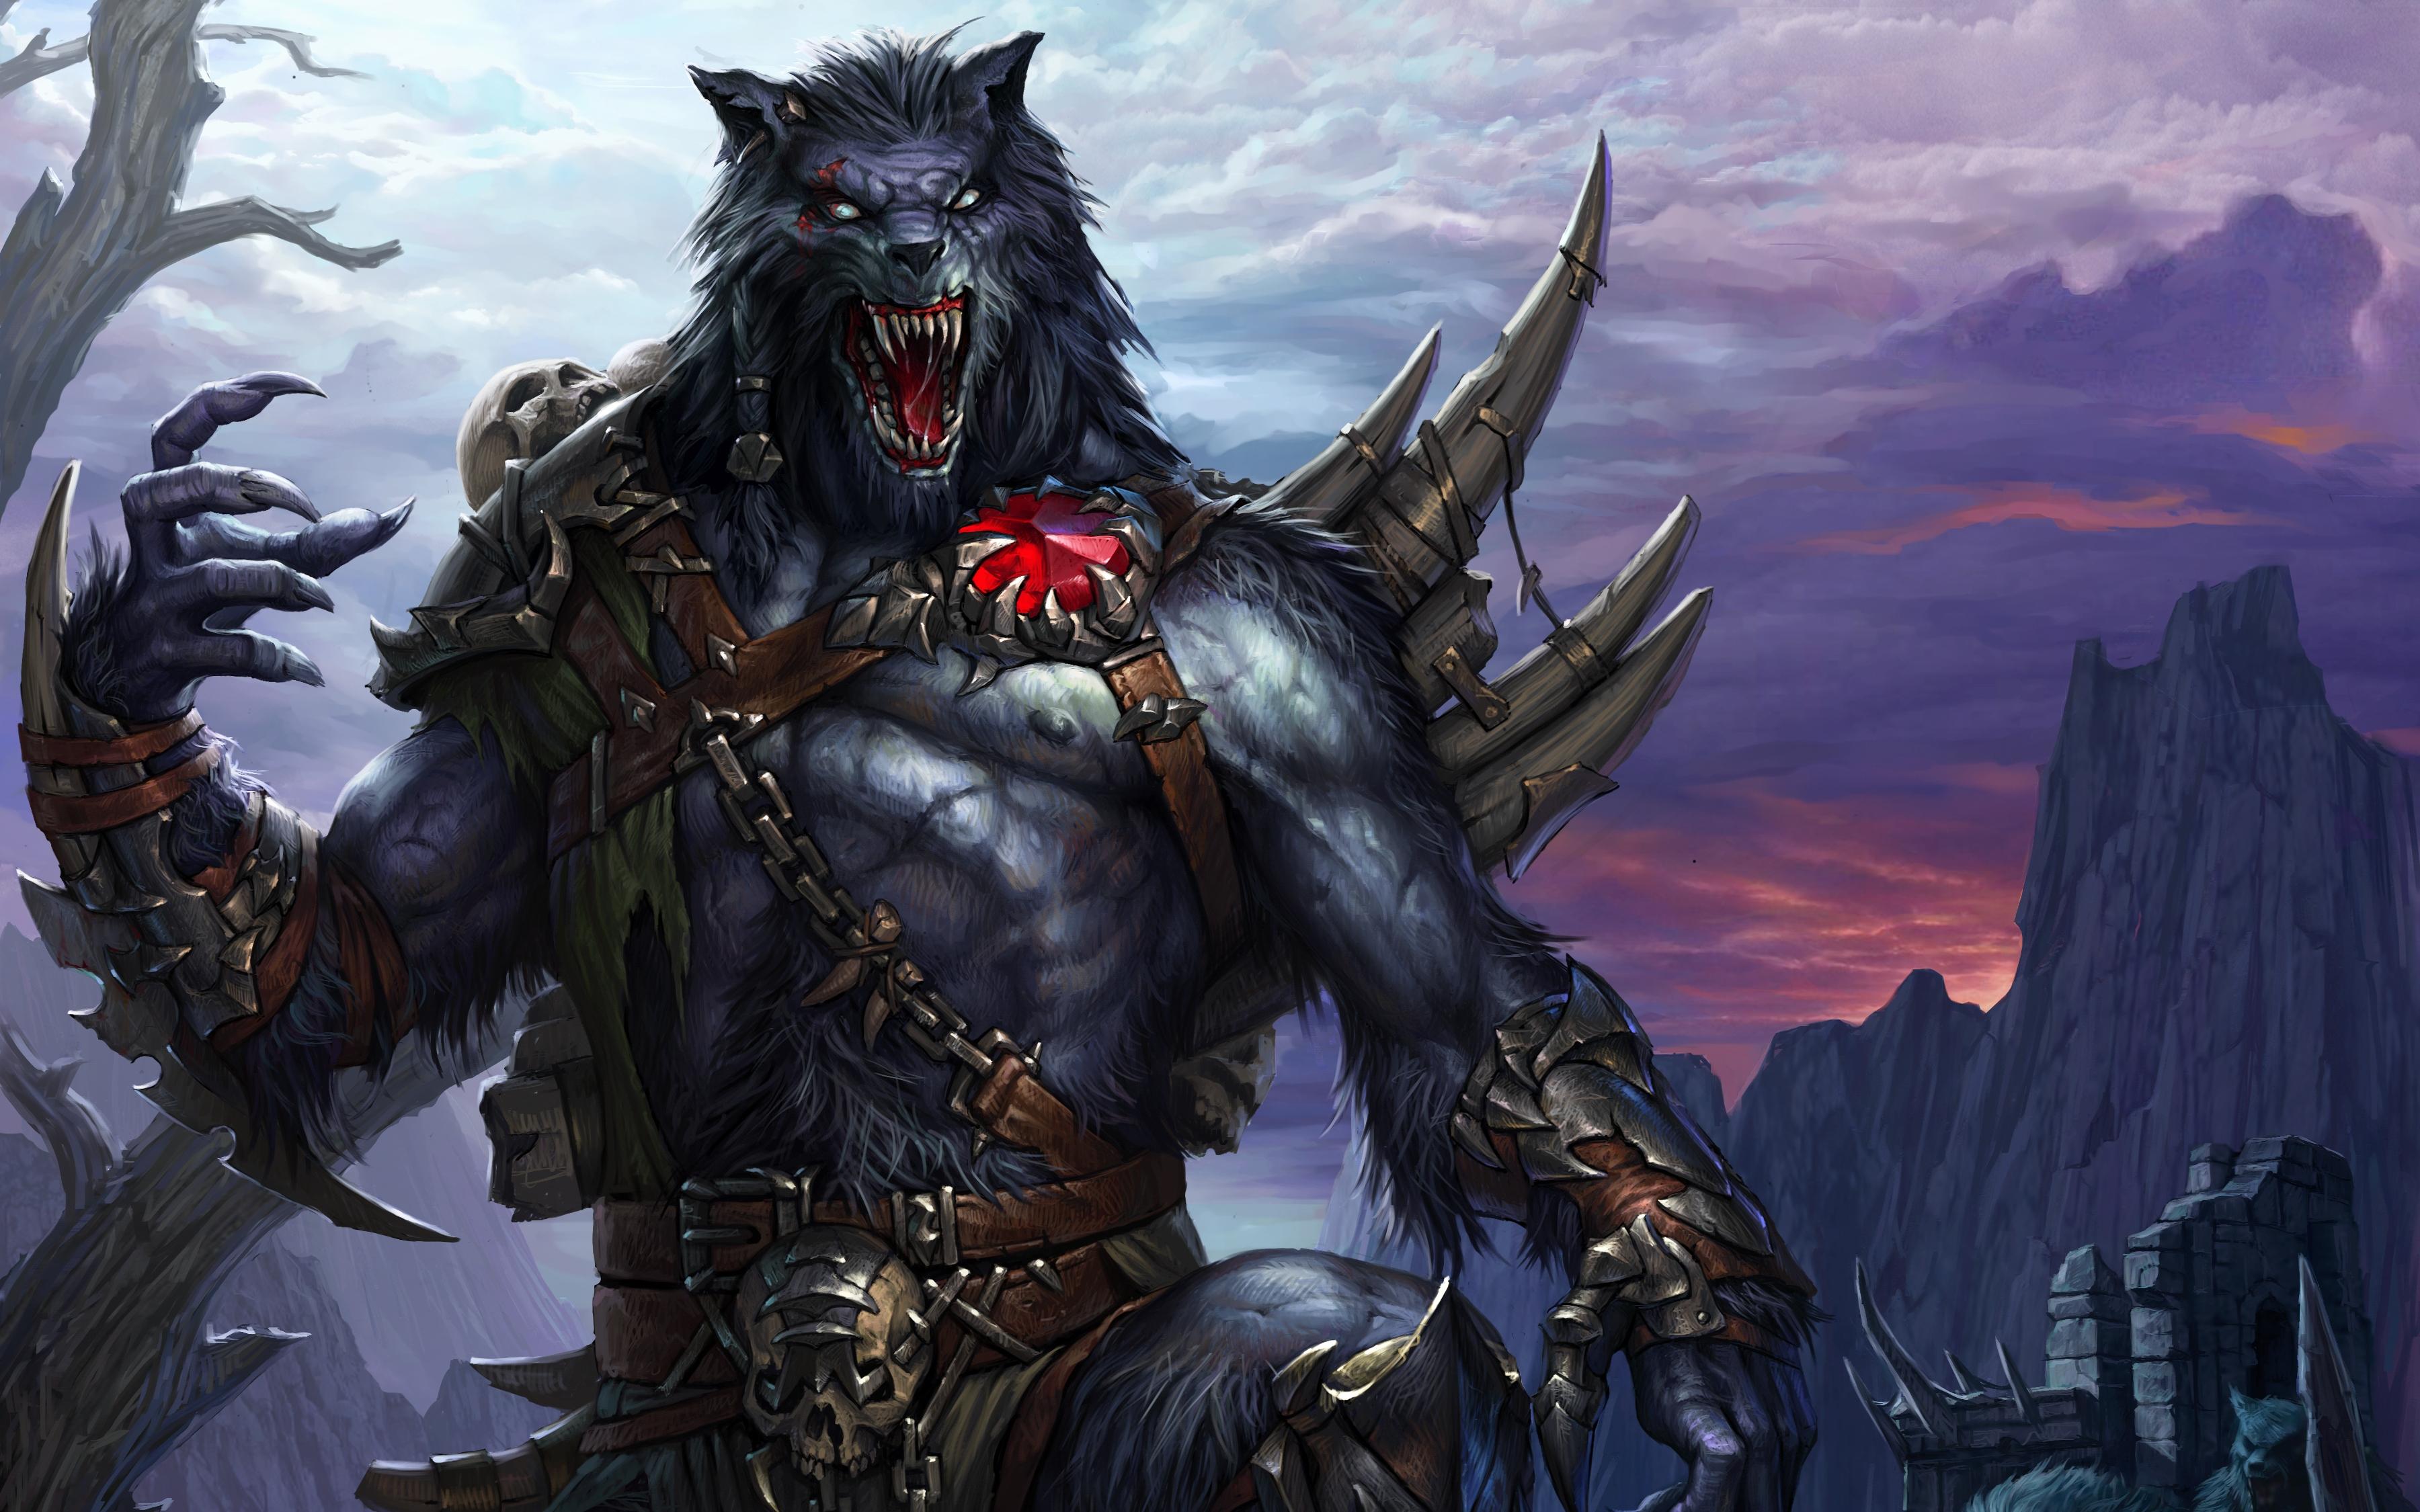 Werewolf Computer Wallpapers Desktop Backgrounds 3600x2250 ID 3600x2250